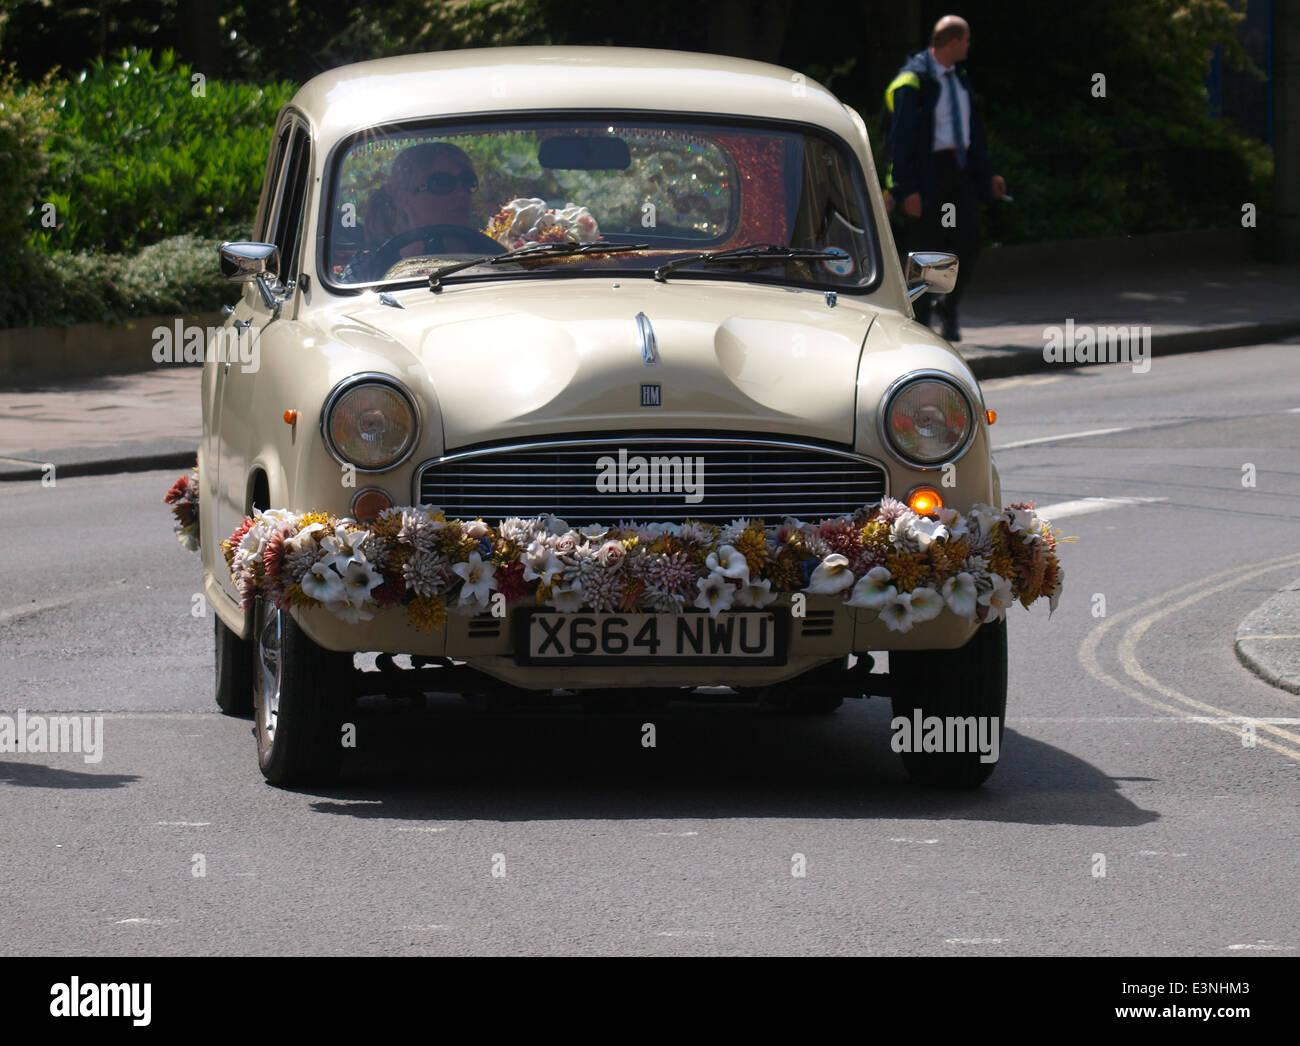 Hindustan Motors, Ambassador car decorated with flowers, Oxford, UK - Stock Image